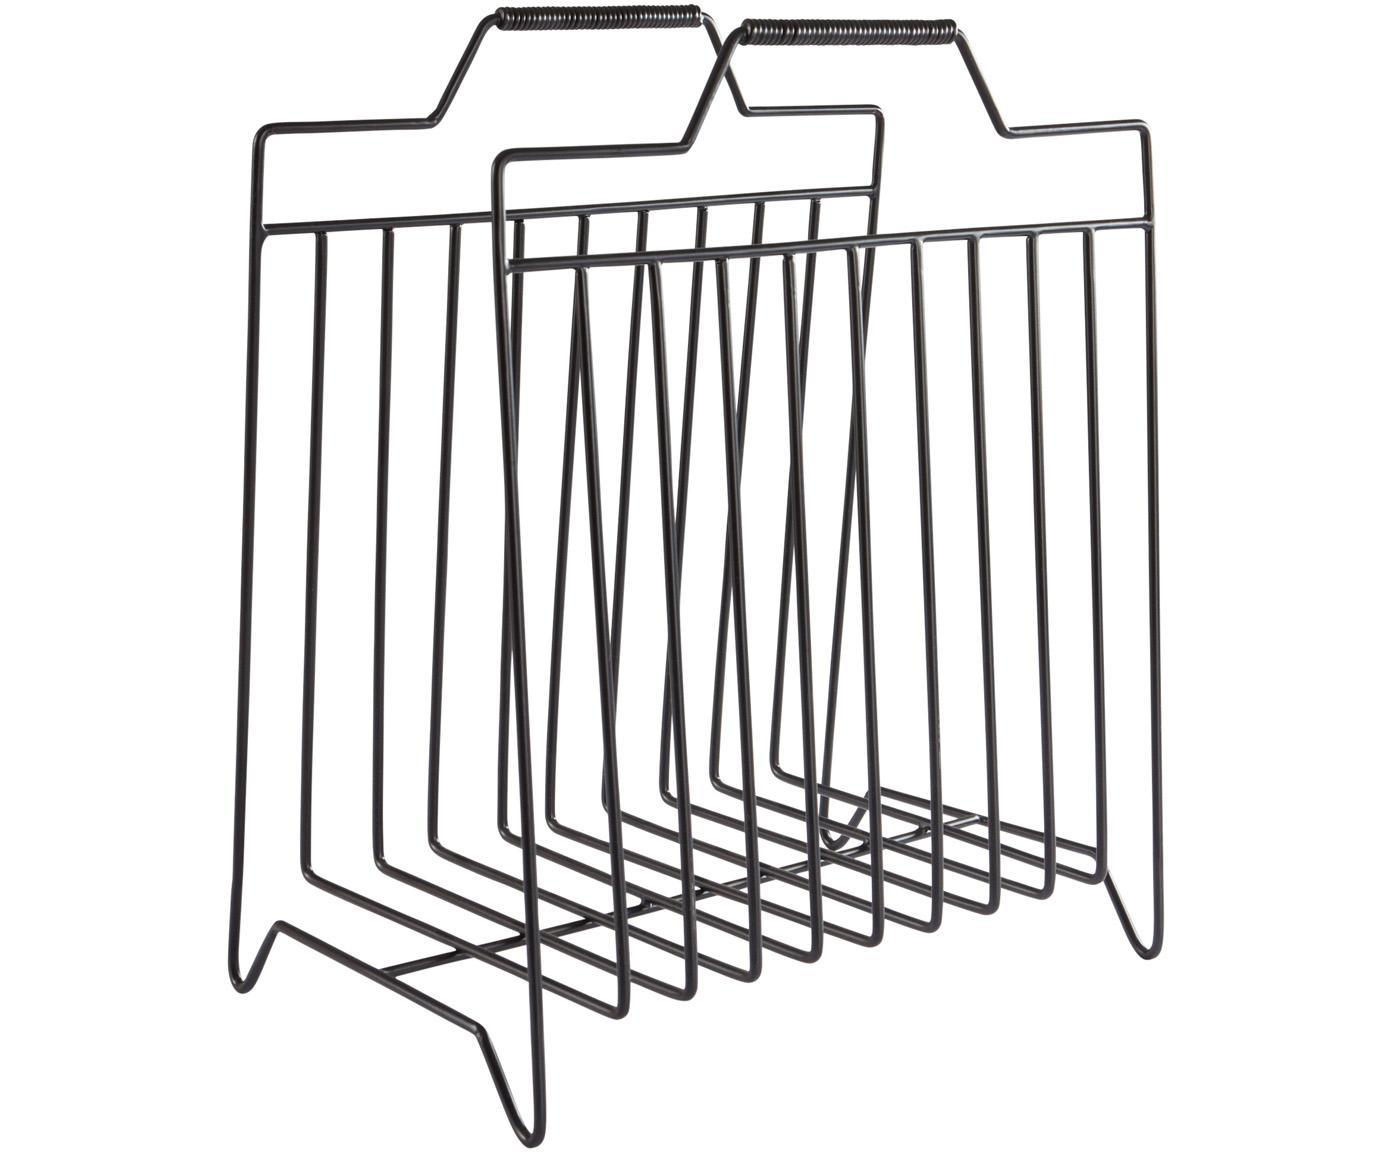 Portariviste Maud, Metallo verniciato, Nero, Larg. 43 x Alt. 36 cm